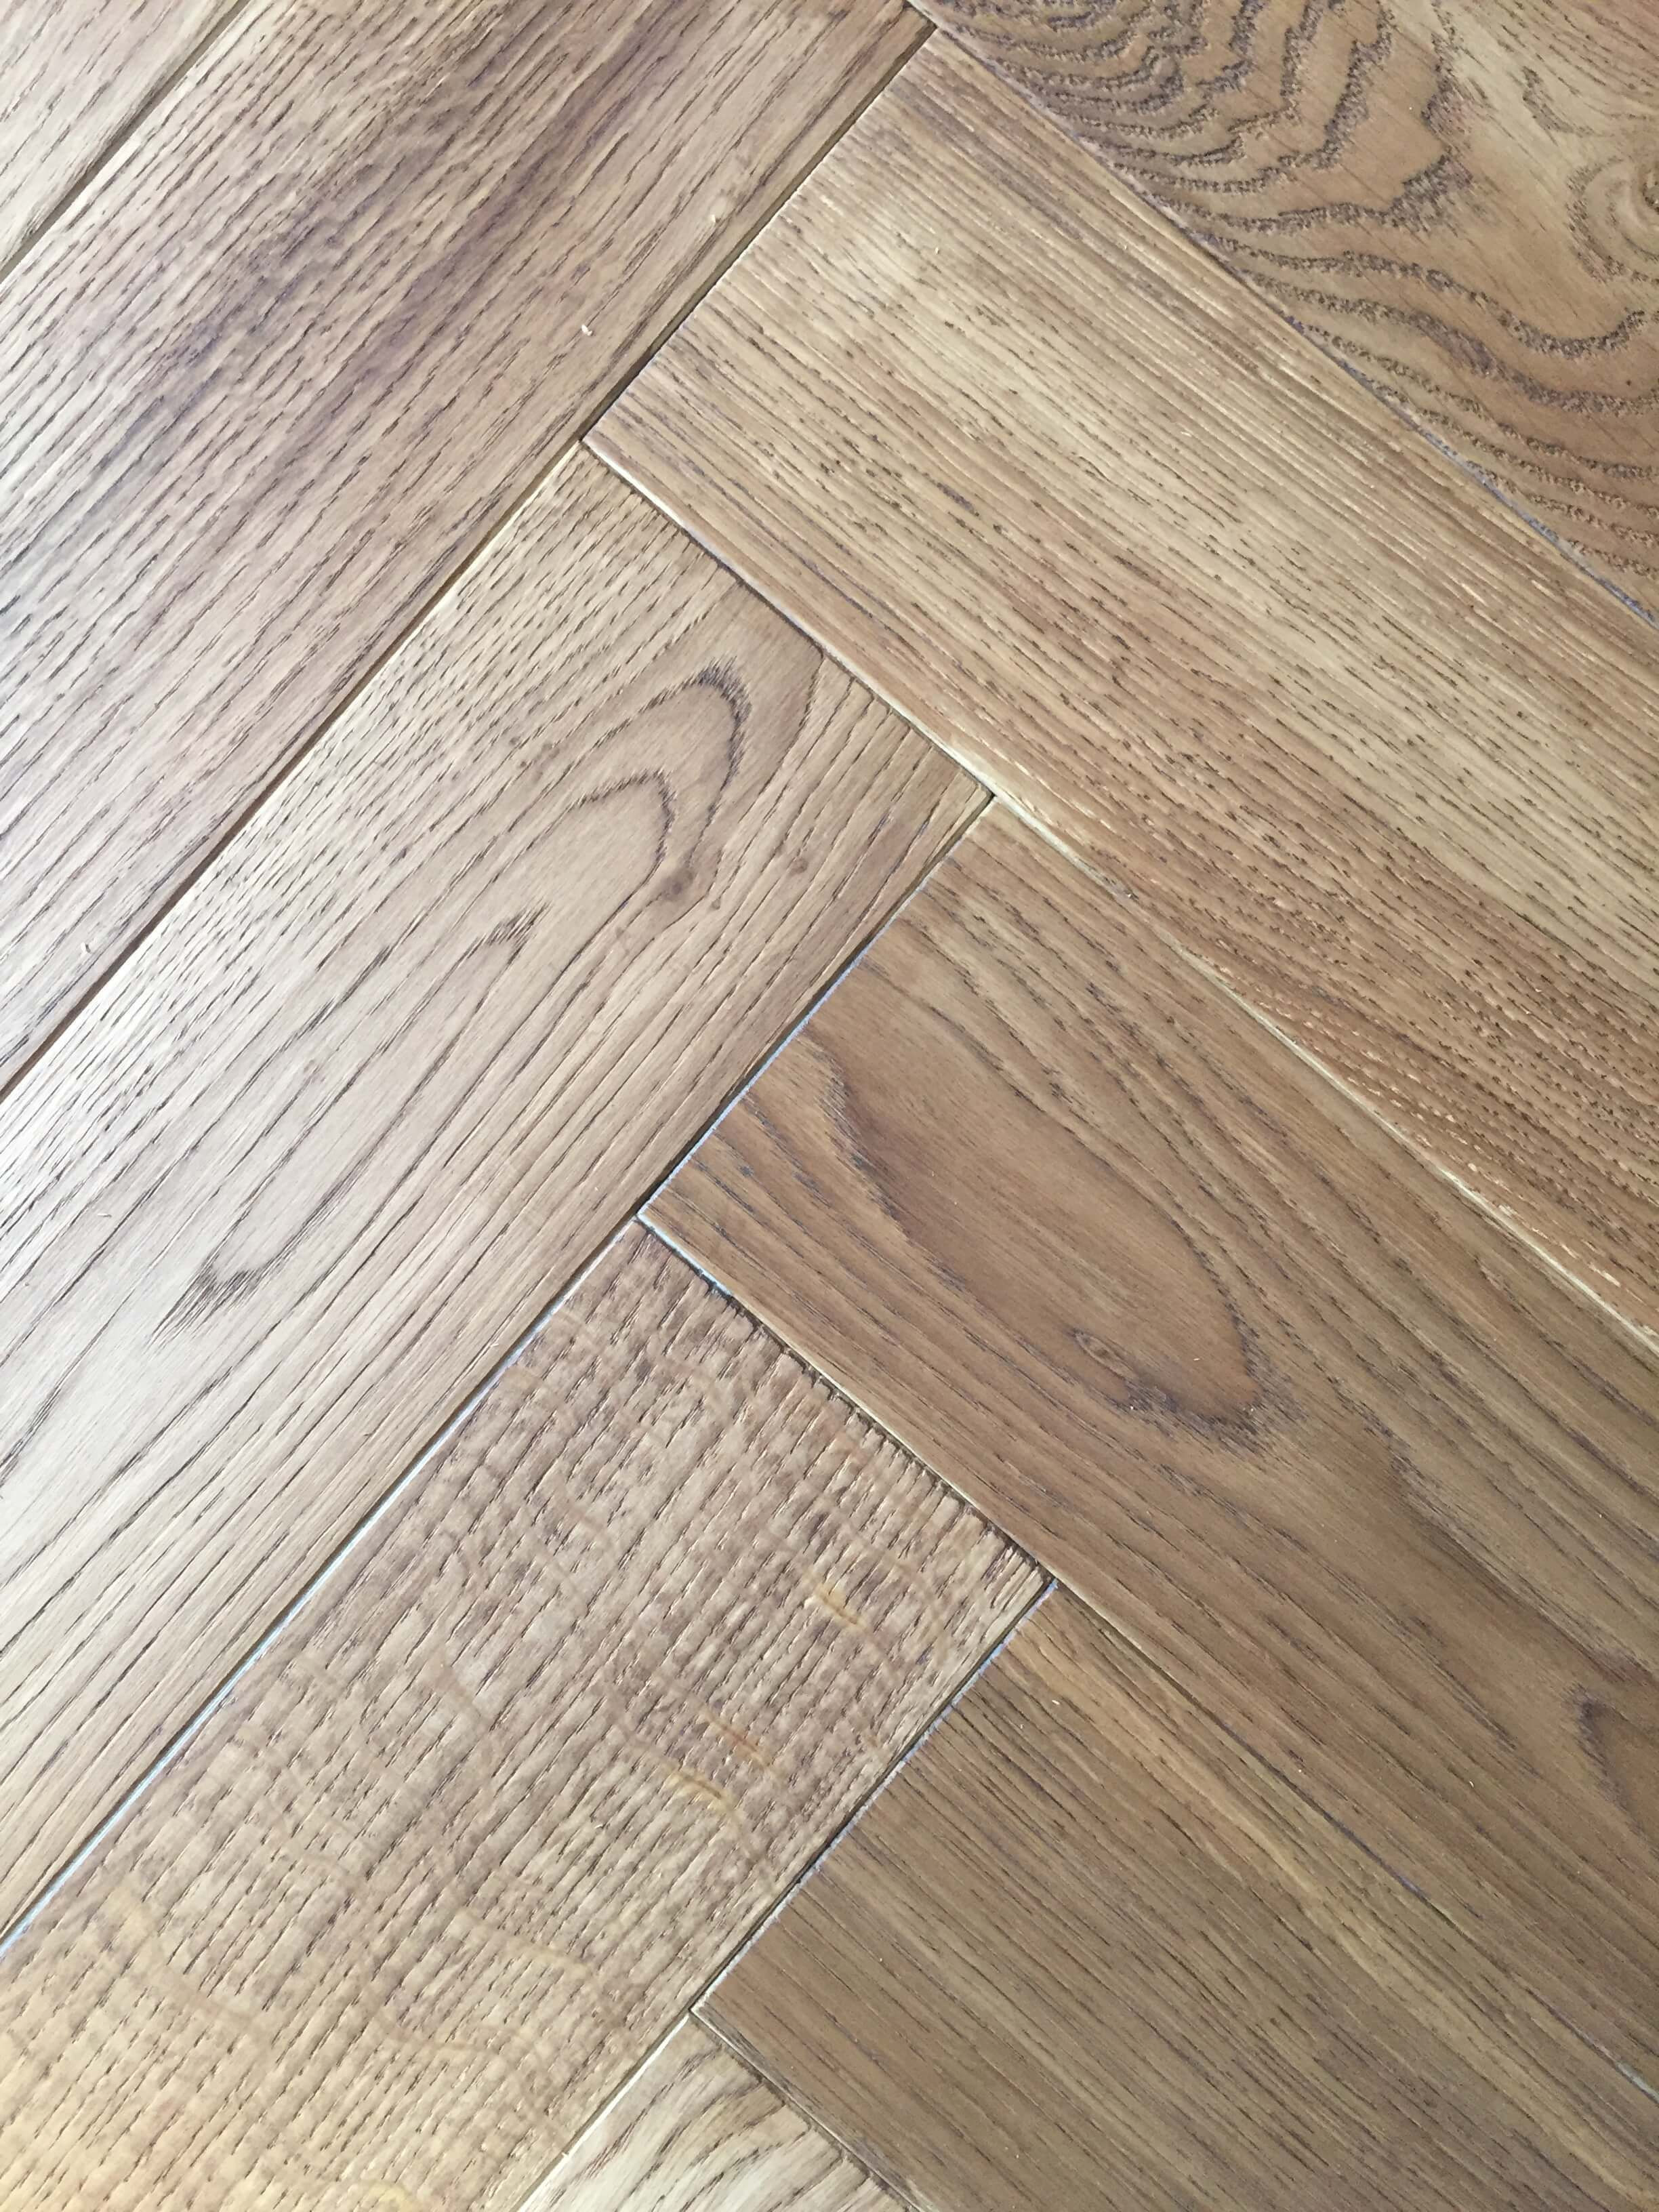 laminate flooring versus hardwood of roll out laminate wood flooring bamboo vs hardwood flooring new with roll out laminate wood flooring bamboo vs hardwood flooring new hotel od barcelona projekt parklex